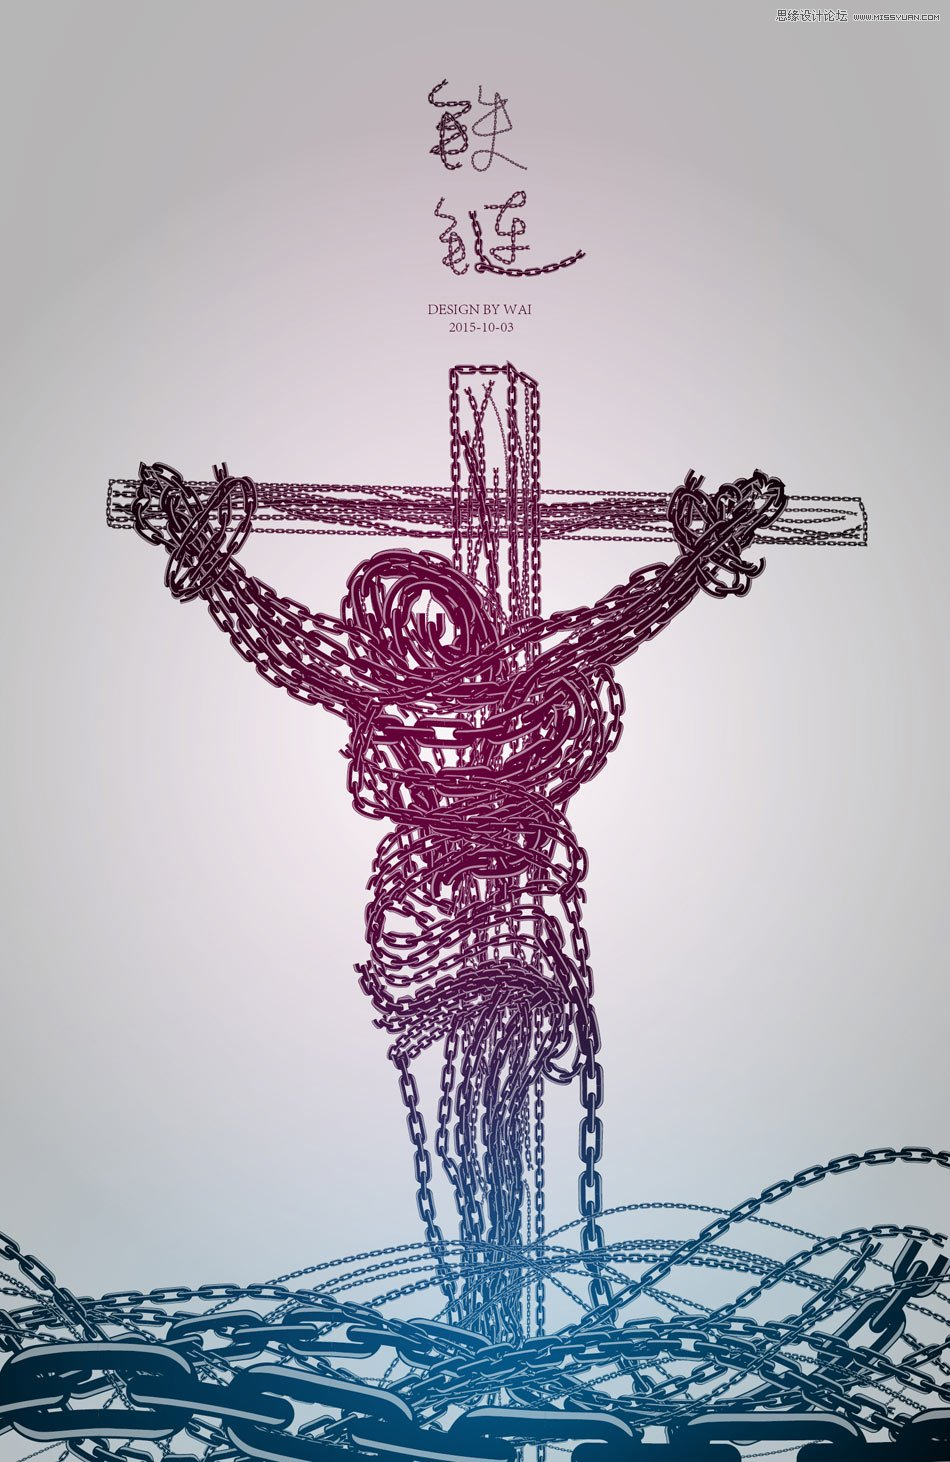 Illustrator巧用画笔工具快速打造铁链效果